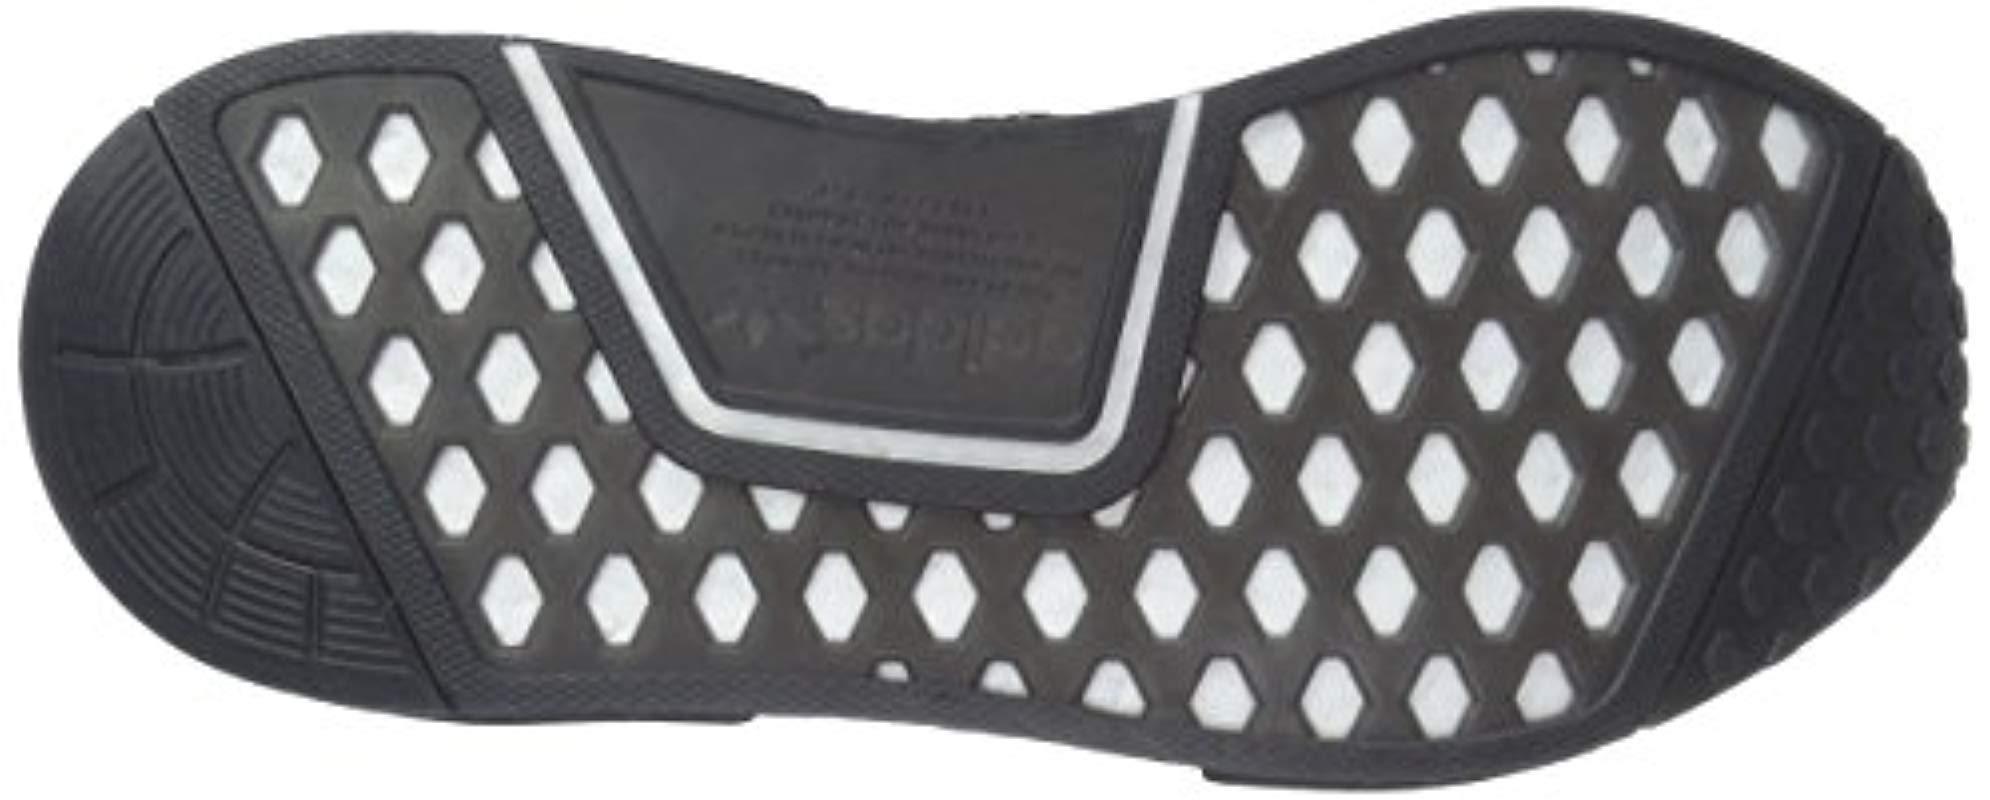 Lyst Adidas Originals Nmd R1 Stlt Pk In Black For Men Save